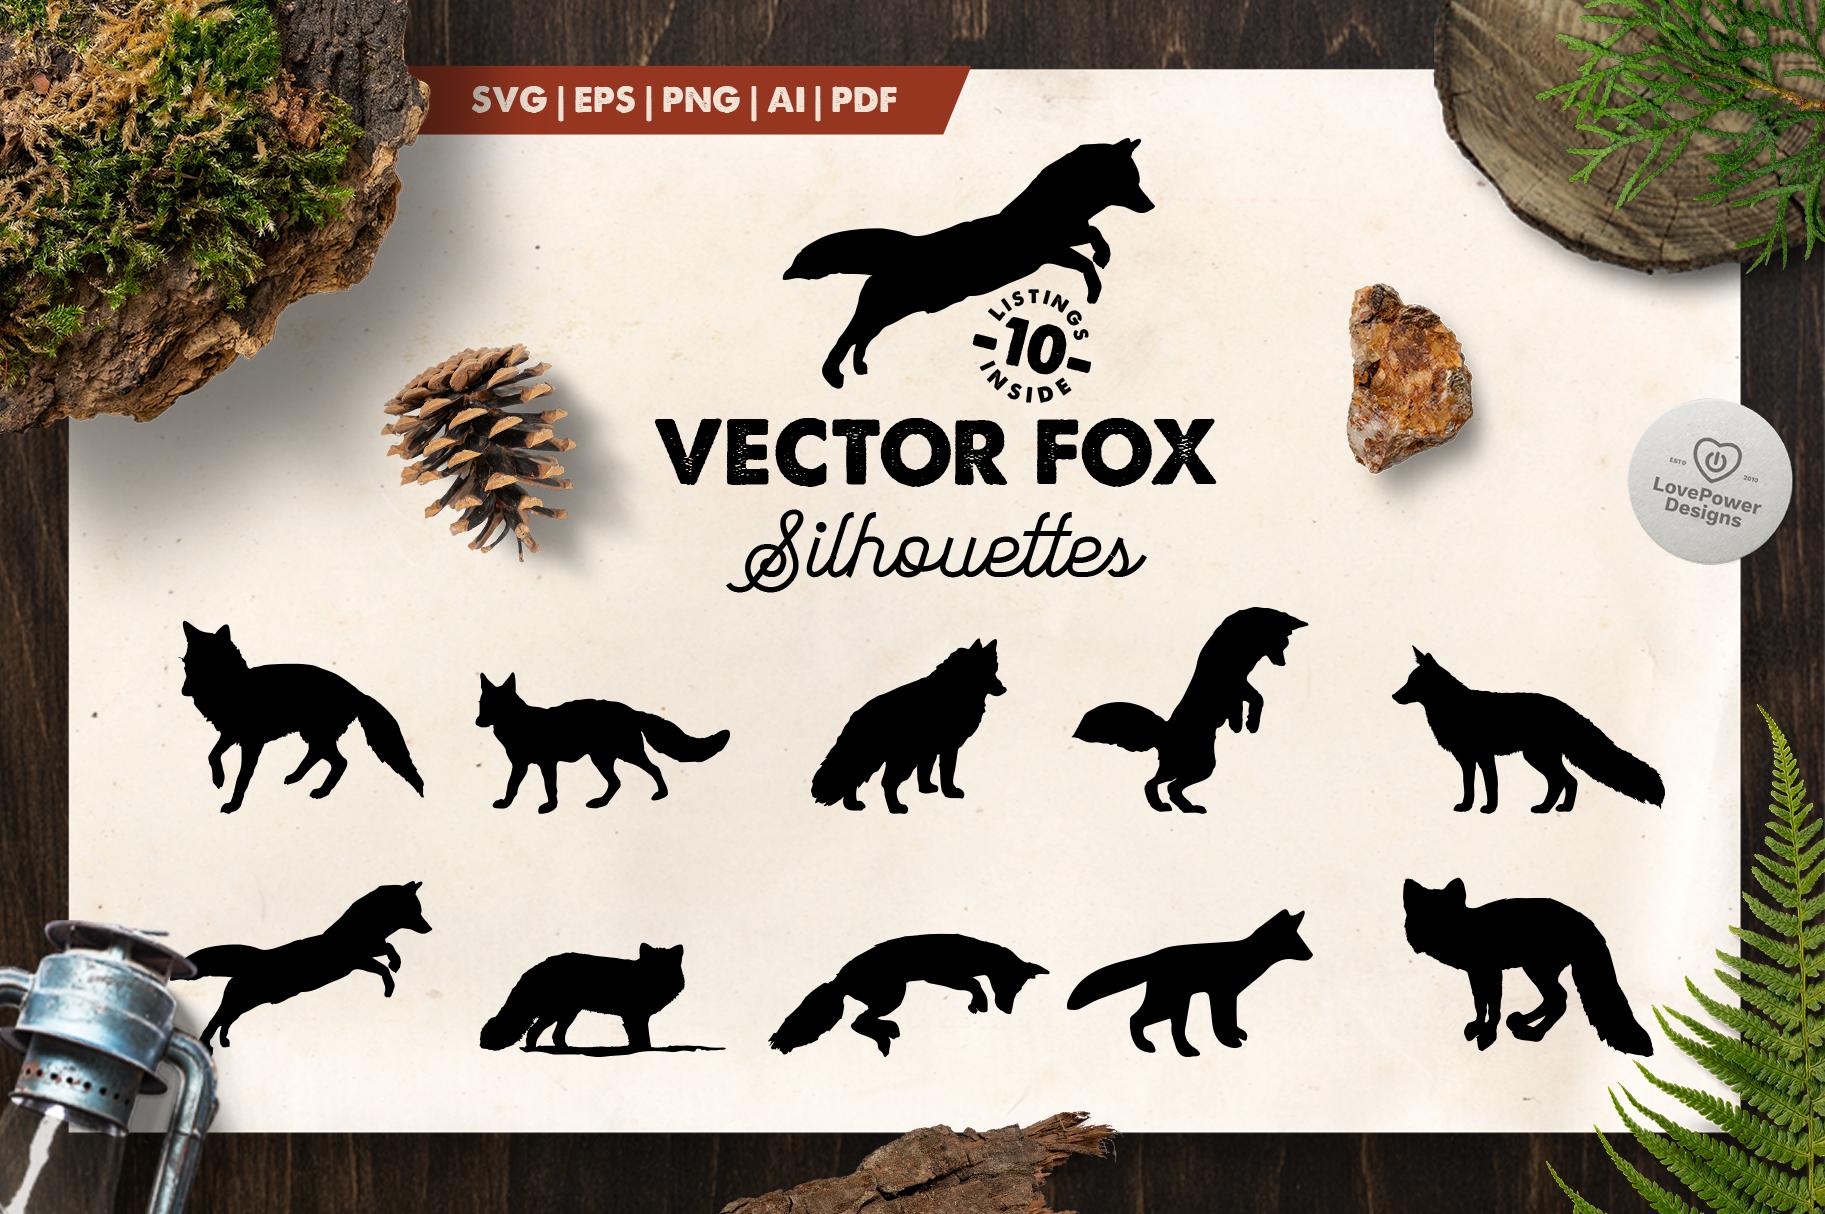 Fox Silhouette | 10 Vector Fox Silhouettes | Fox SVG